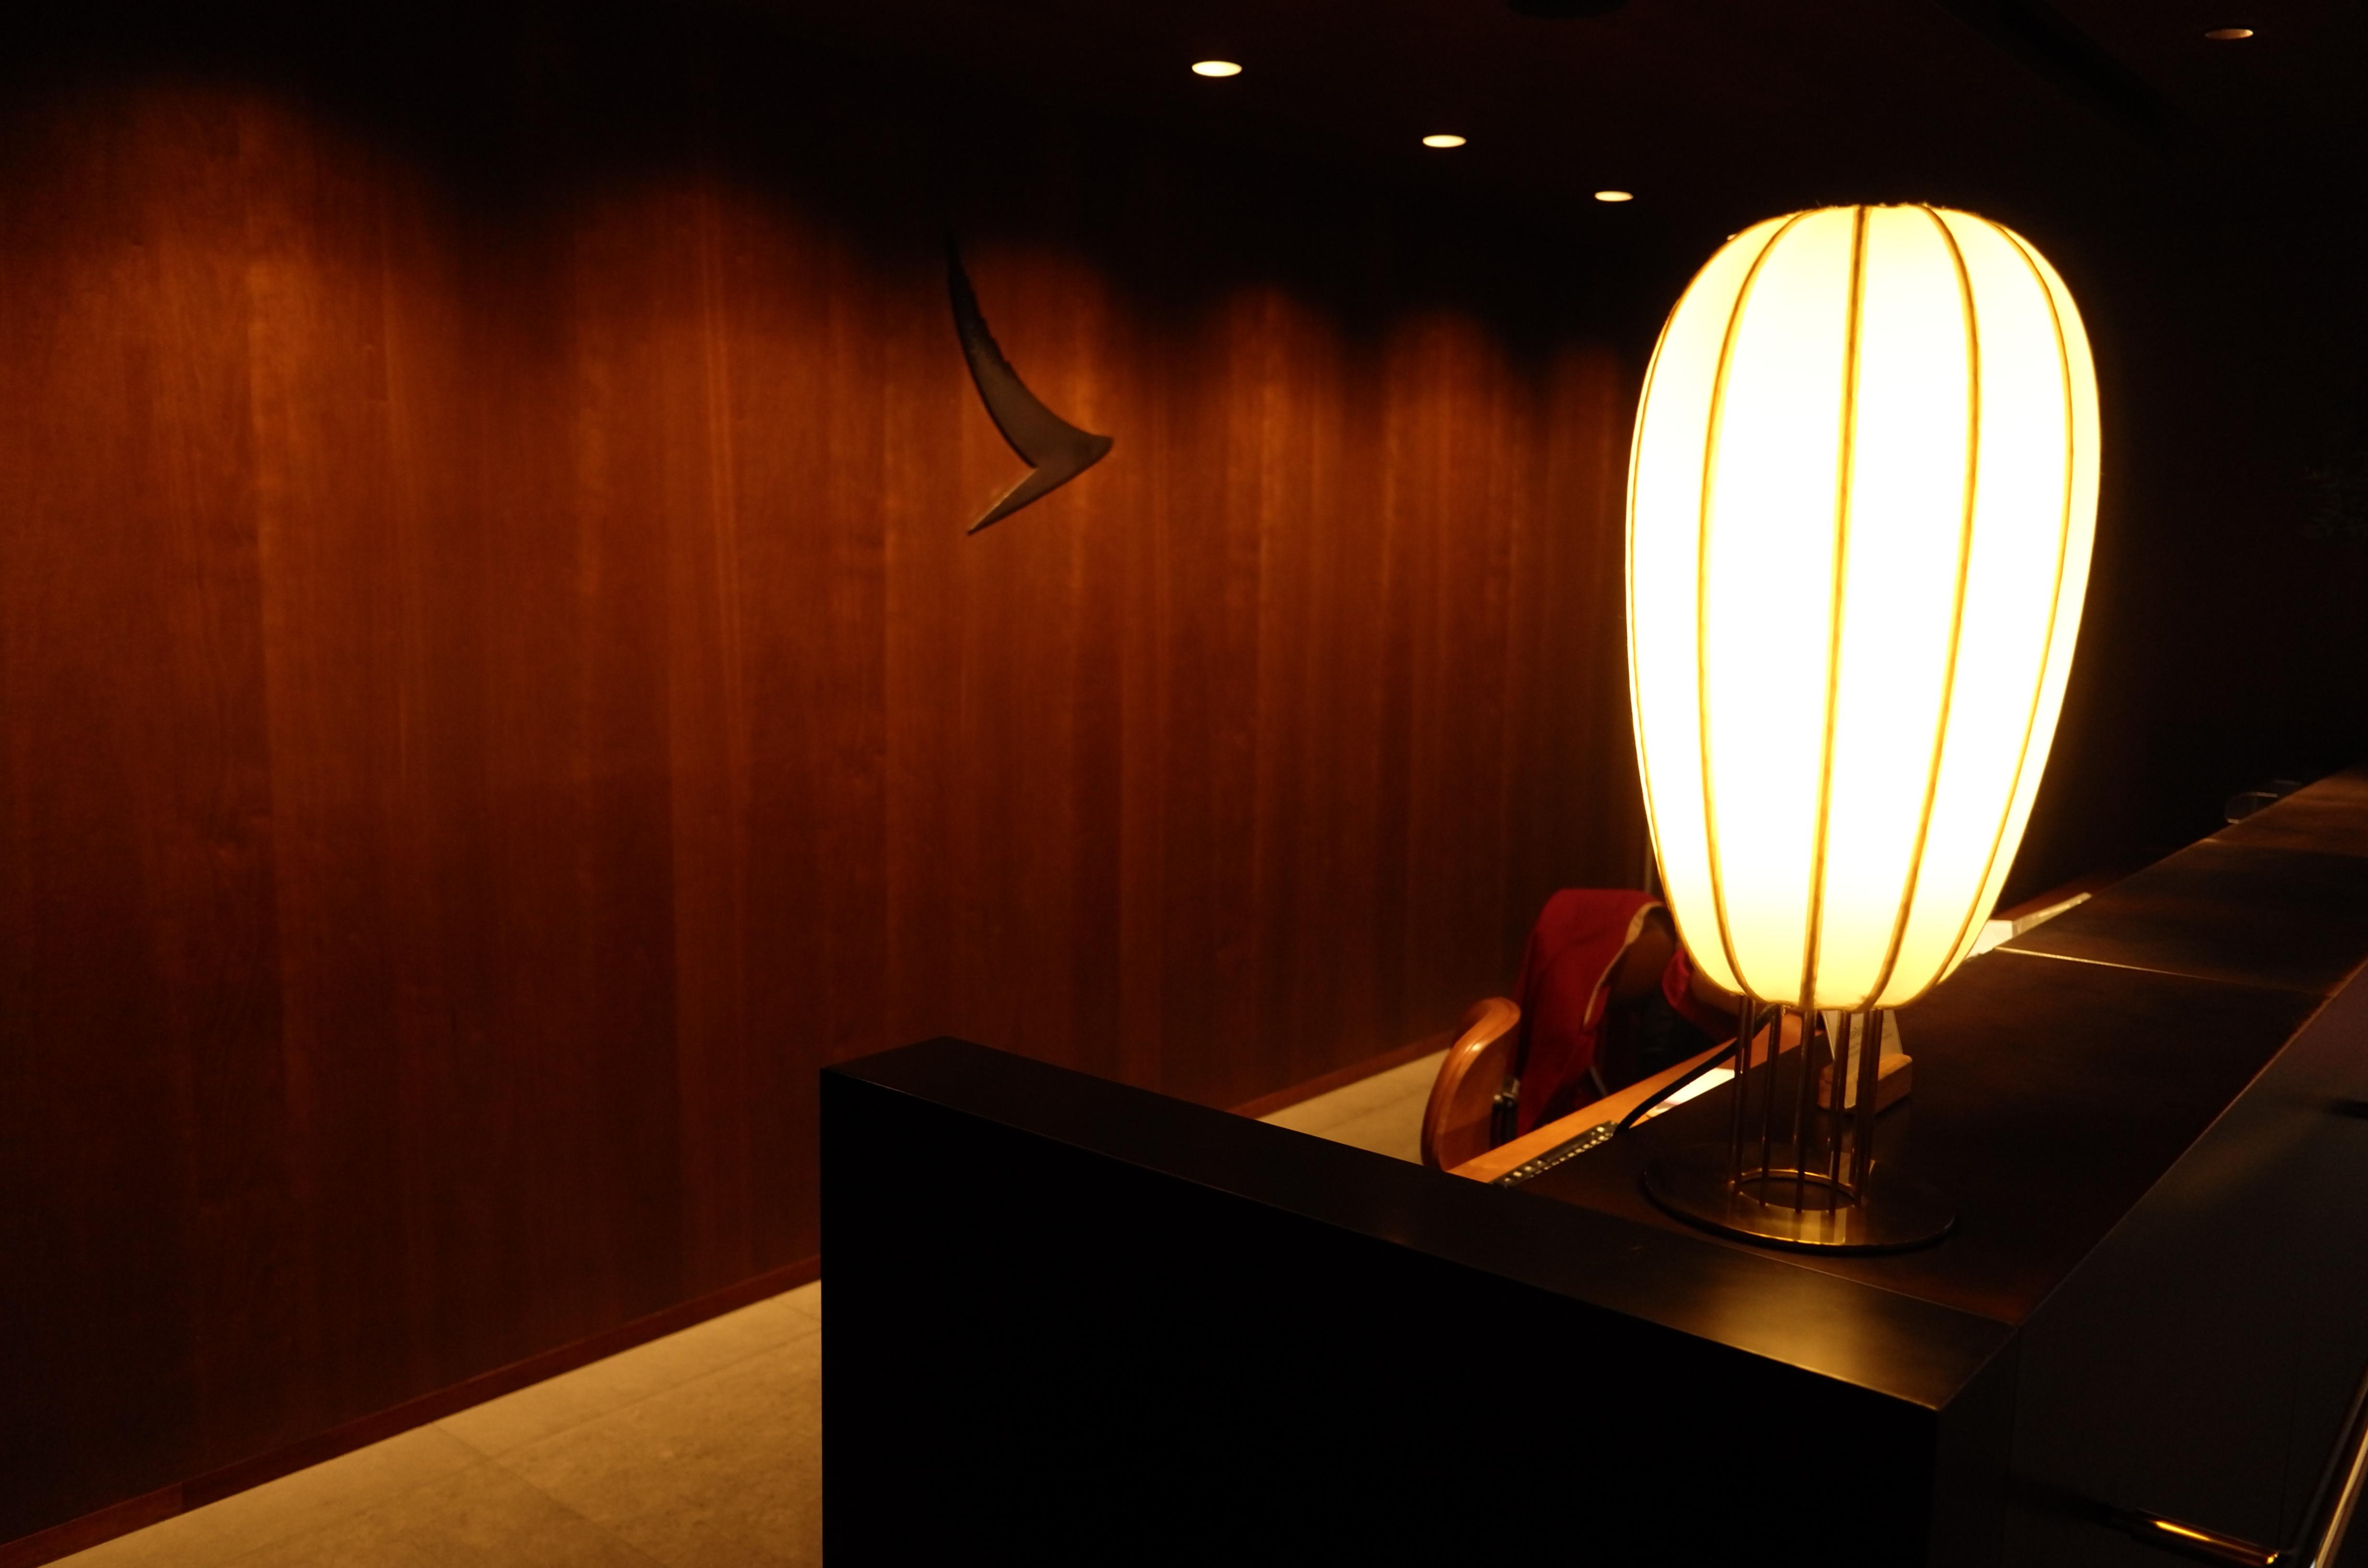 Lounge Review : 台北桃園空港(TPE) キャセイパシフィック航空(CX)ラウンジ